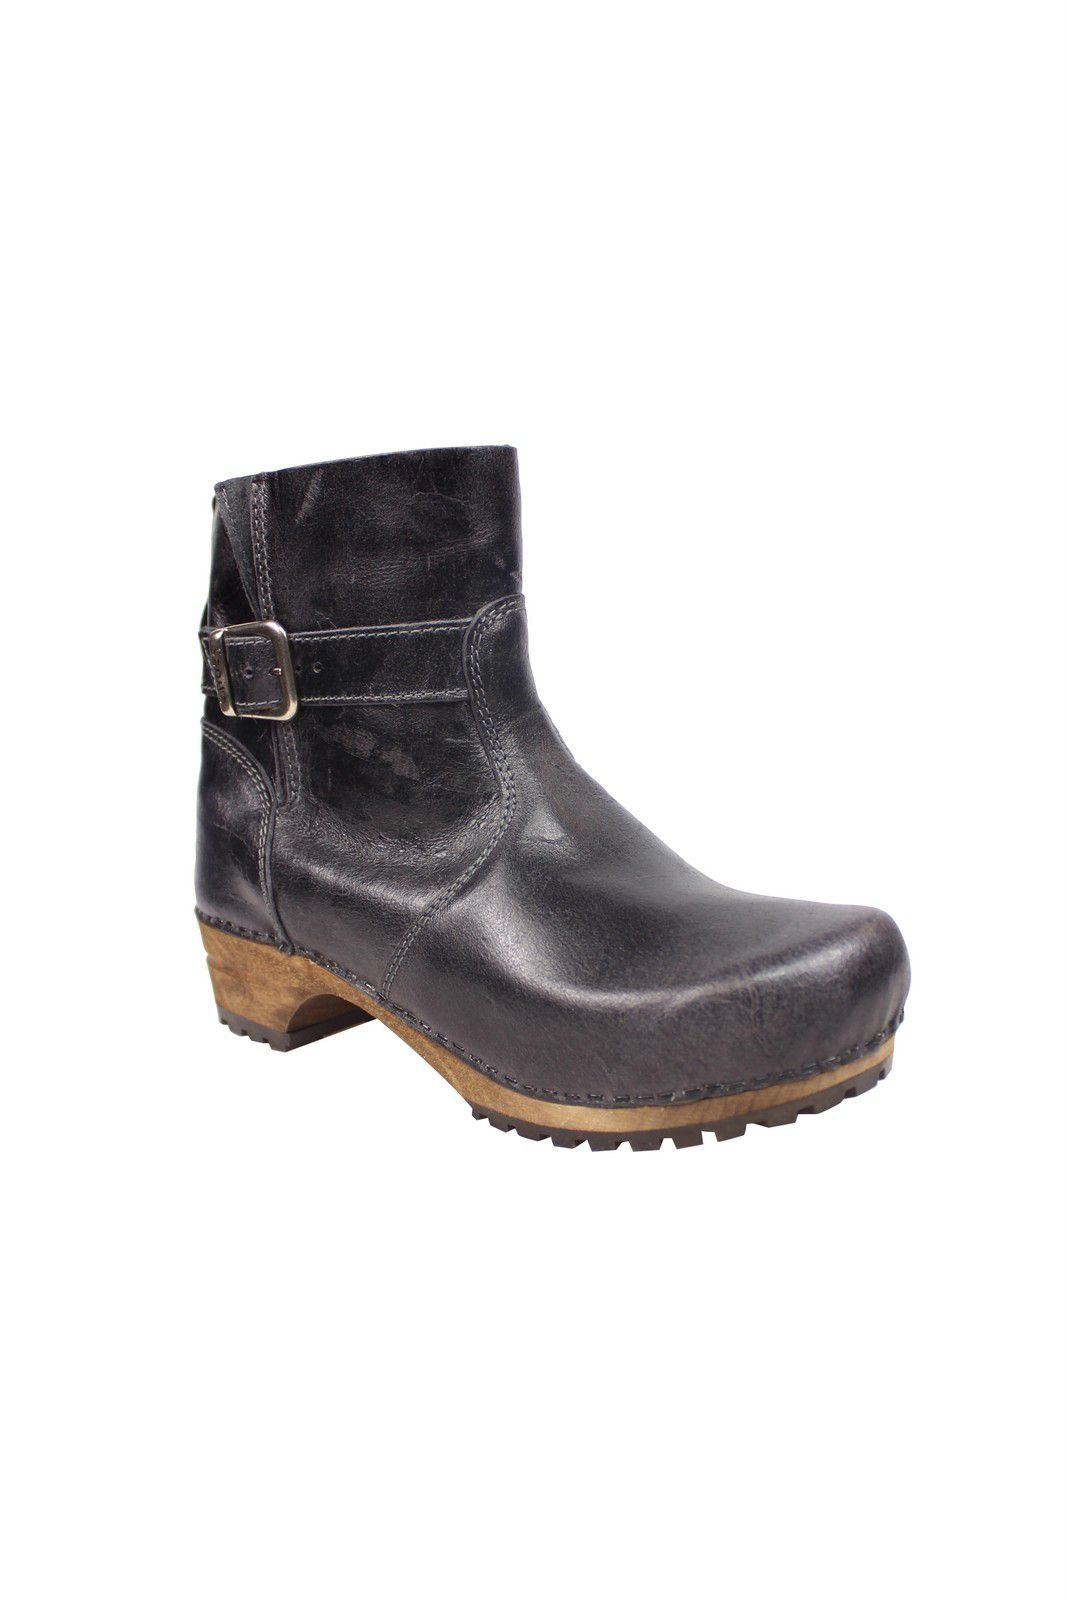 Sanita Mina Low Classic Clog Boot Black 452330 Main